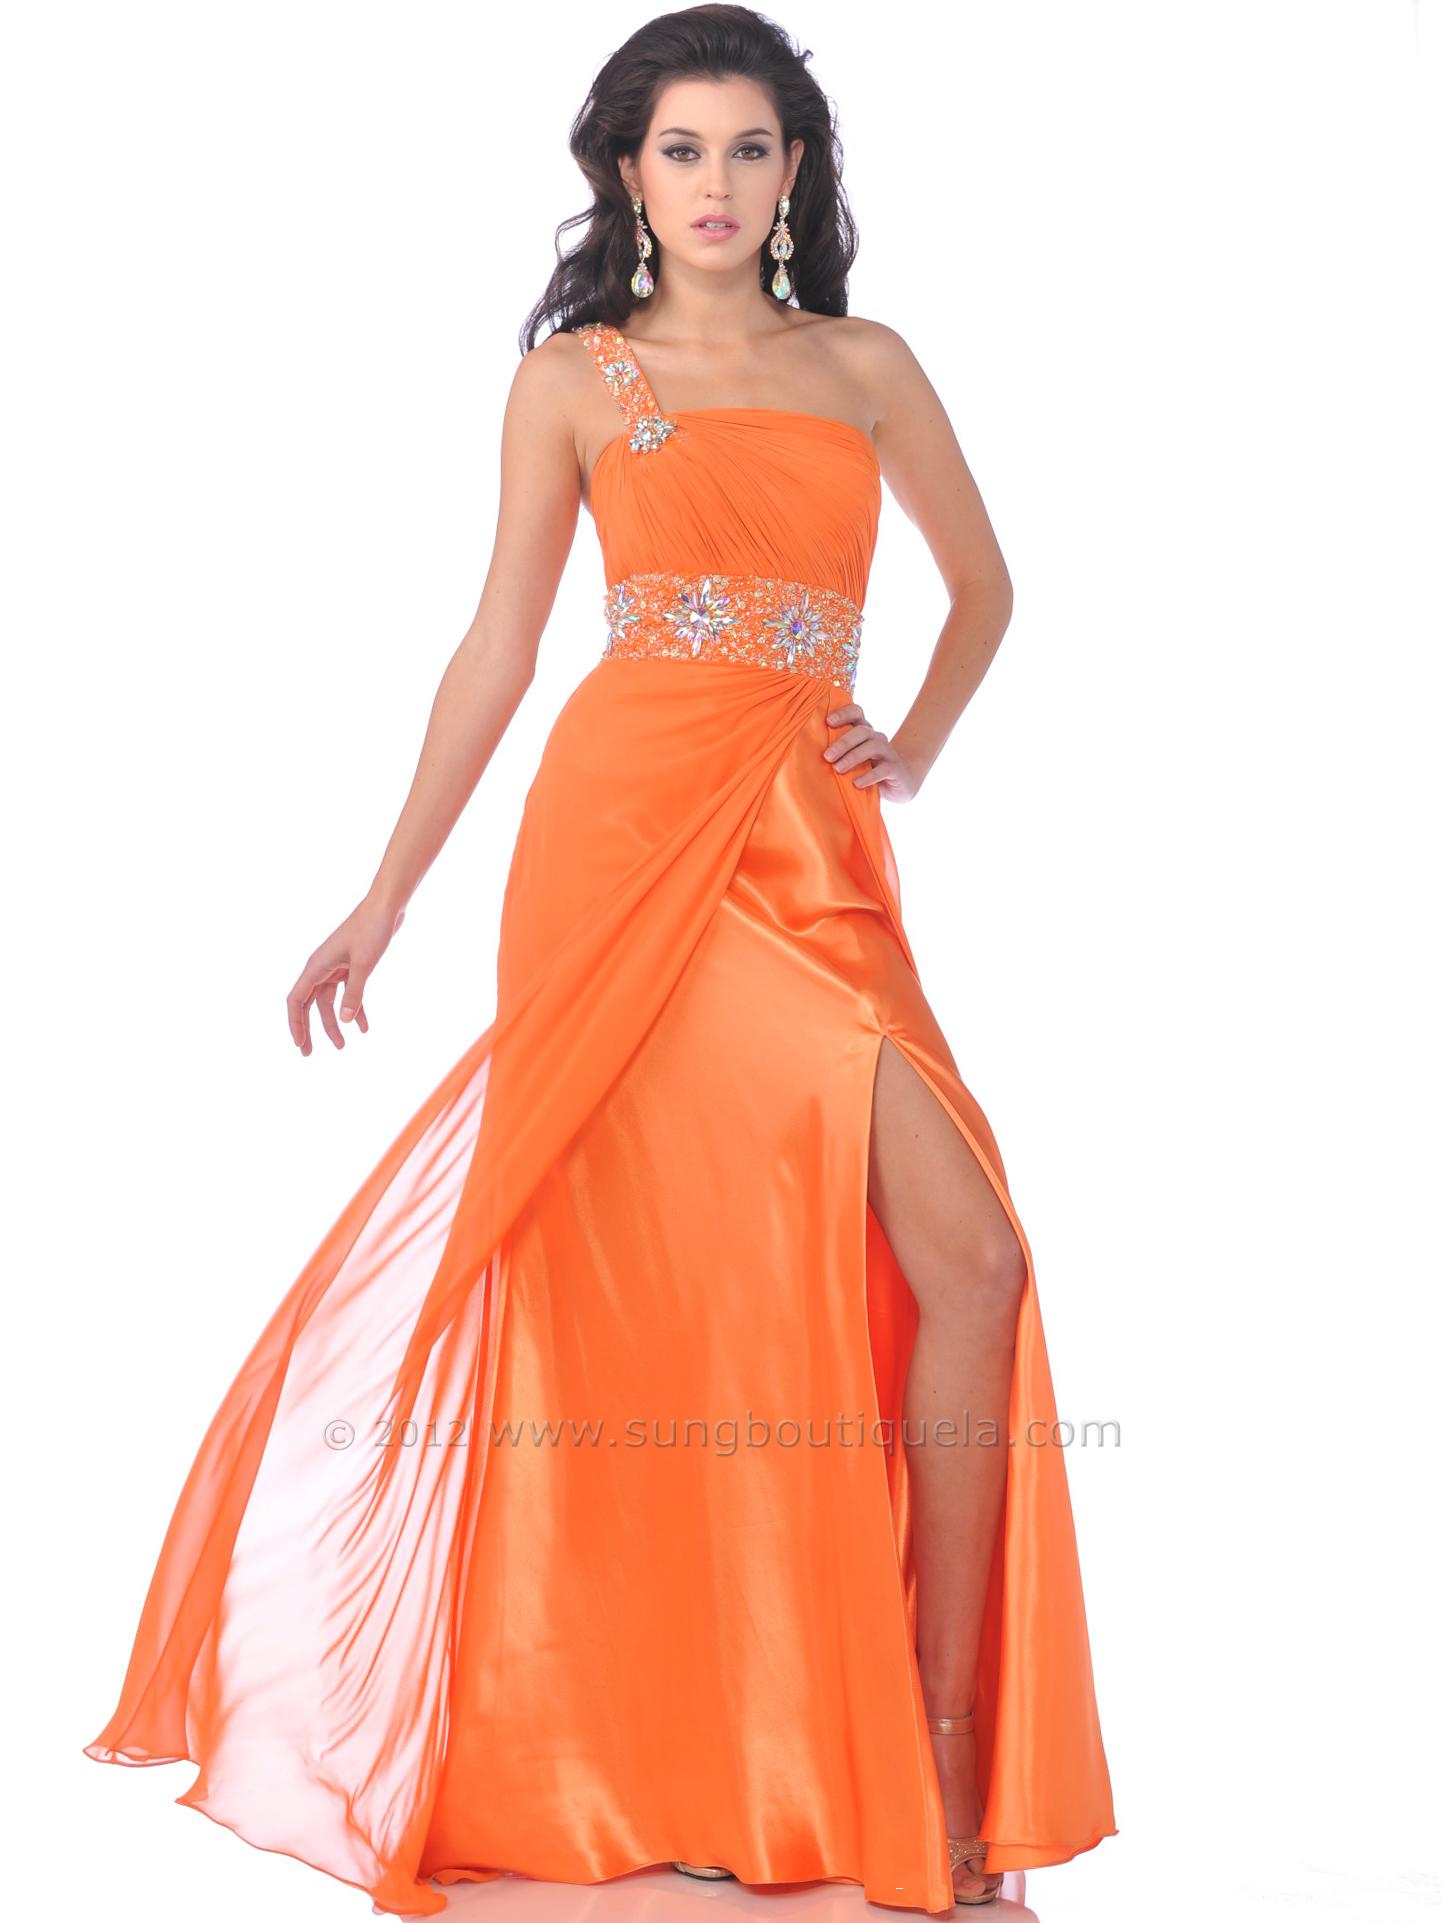 One Shoulder Chiffon Prom Dress | Sung Boutique L.A.